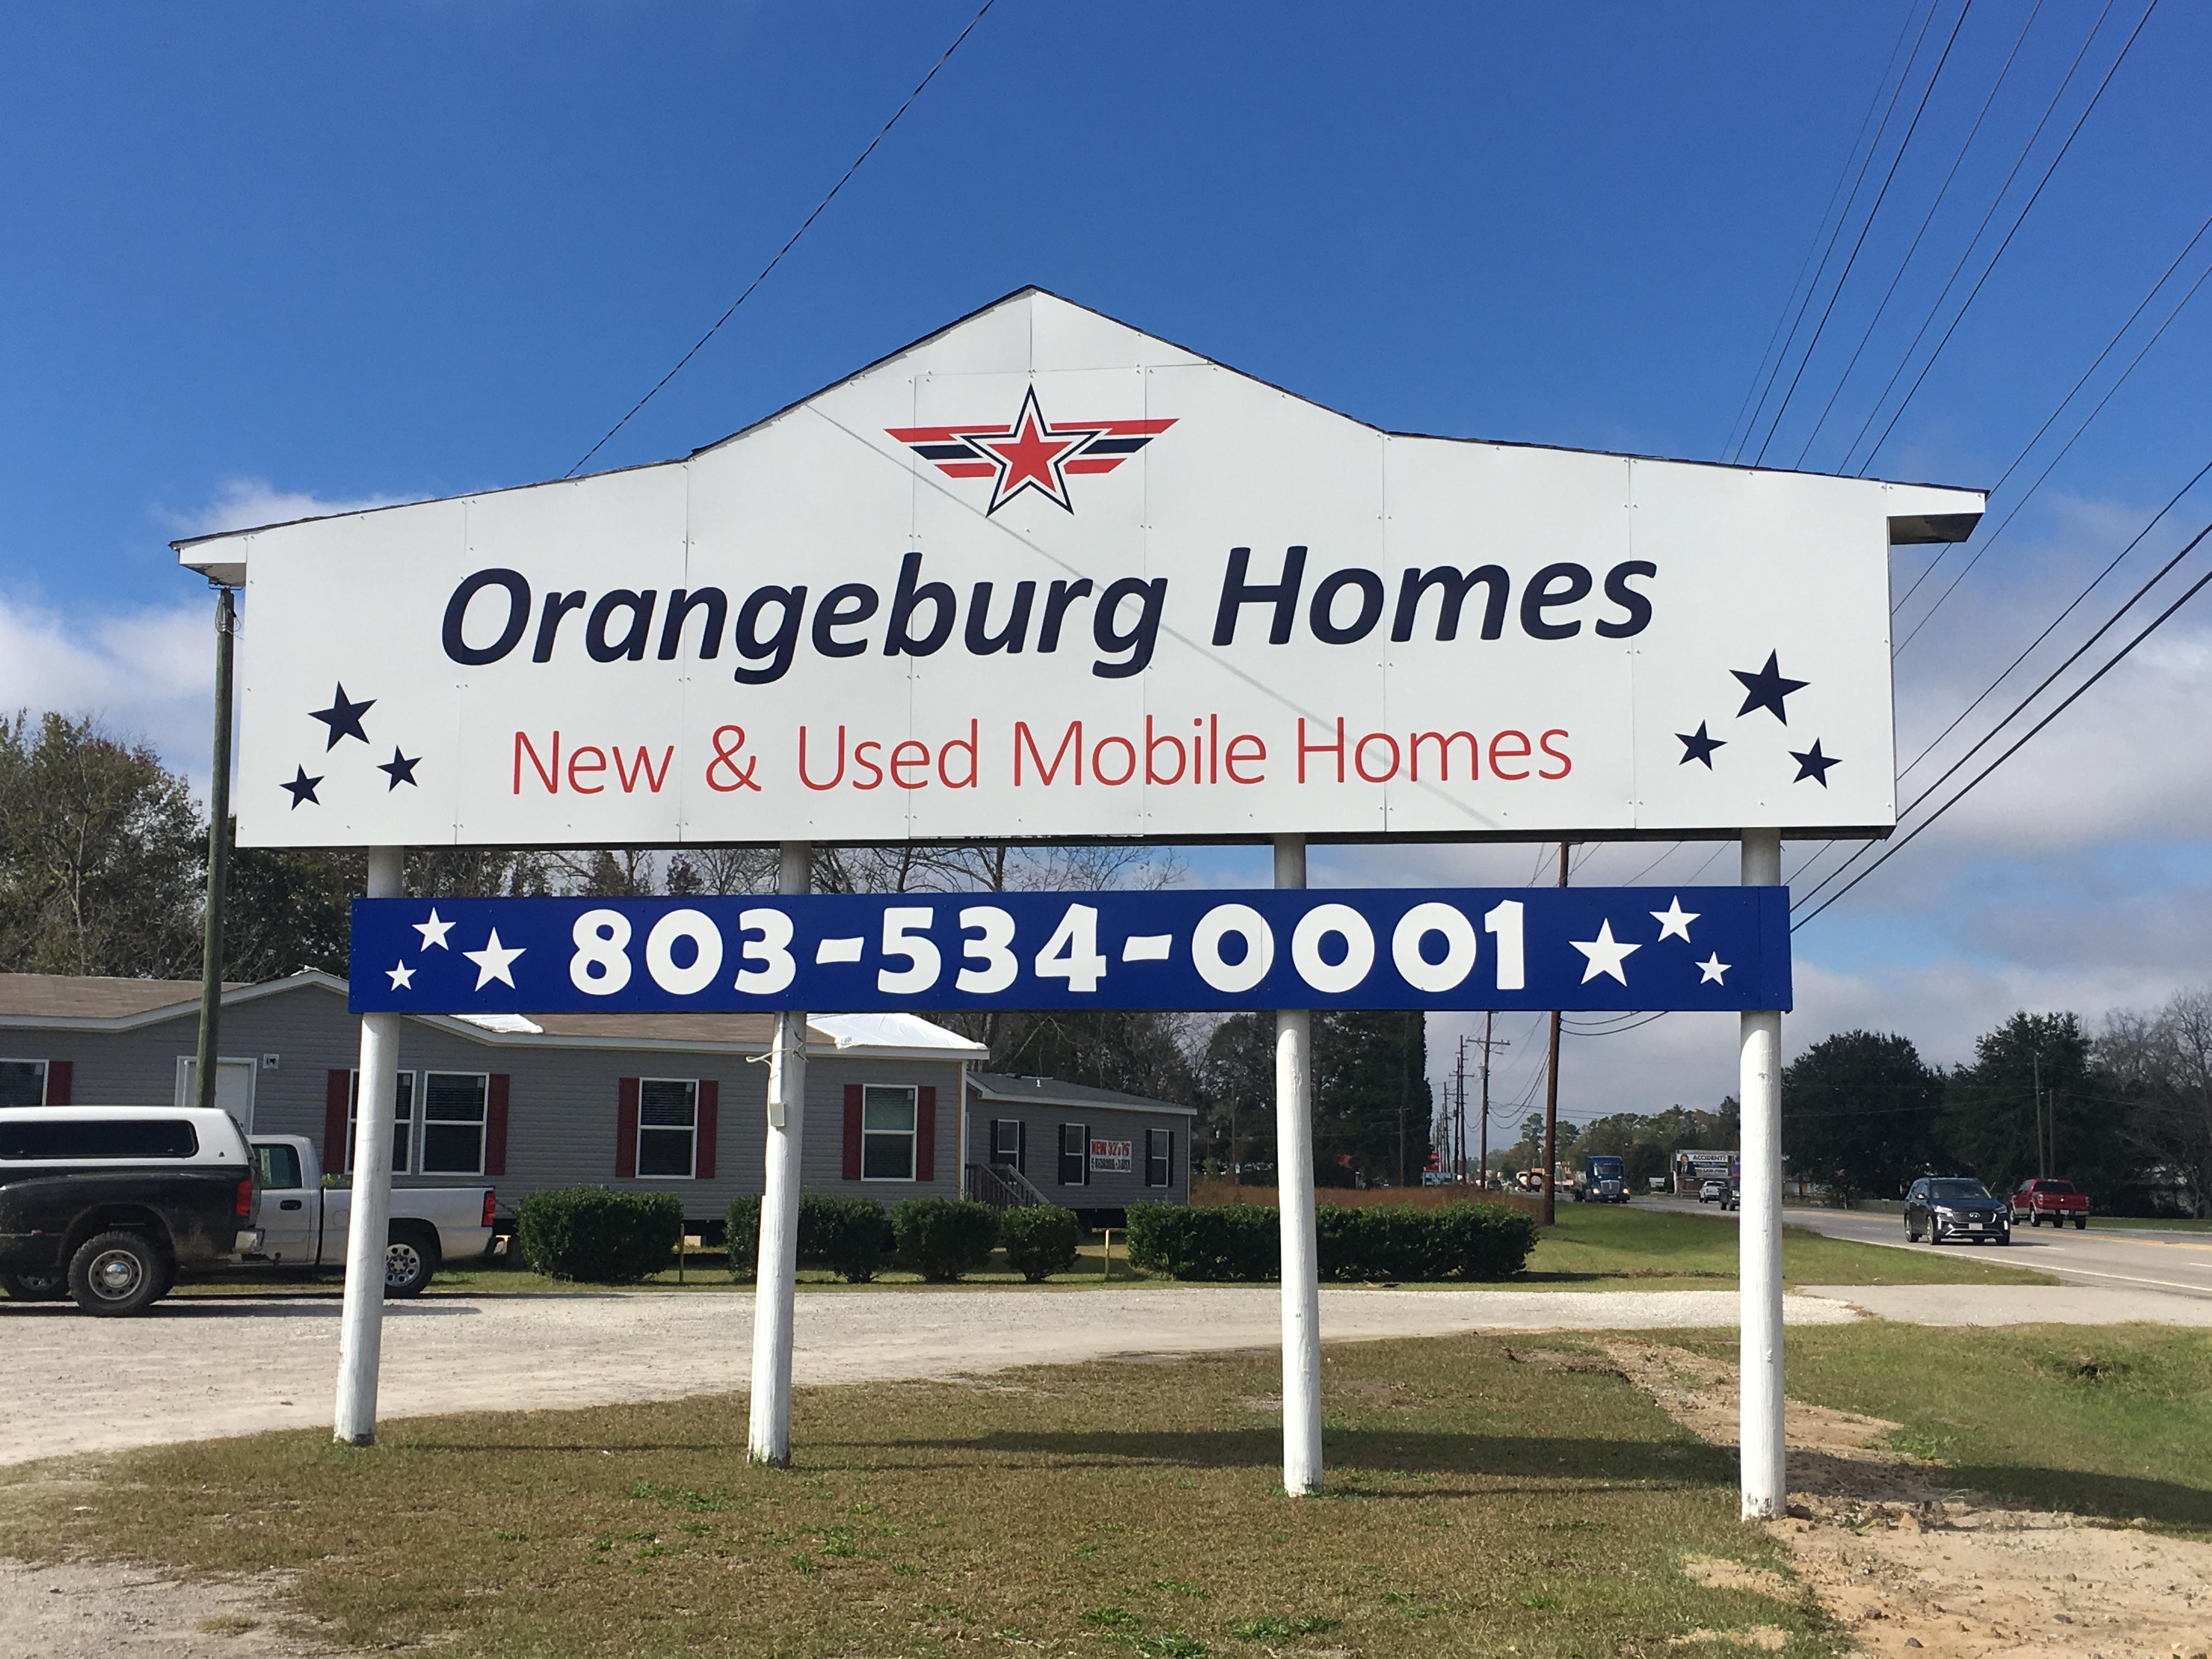 OLE' PATRIOT | Orangeburg Homes